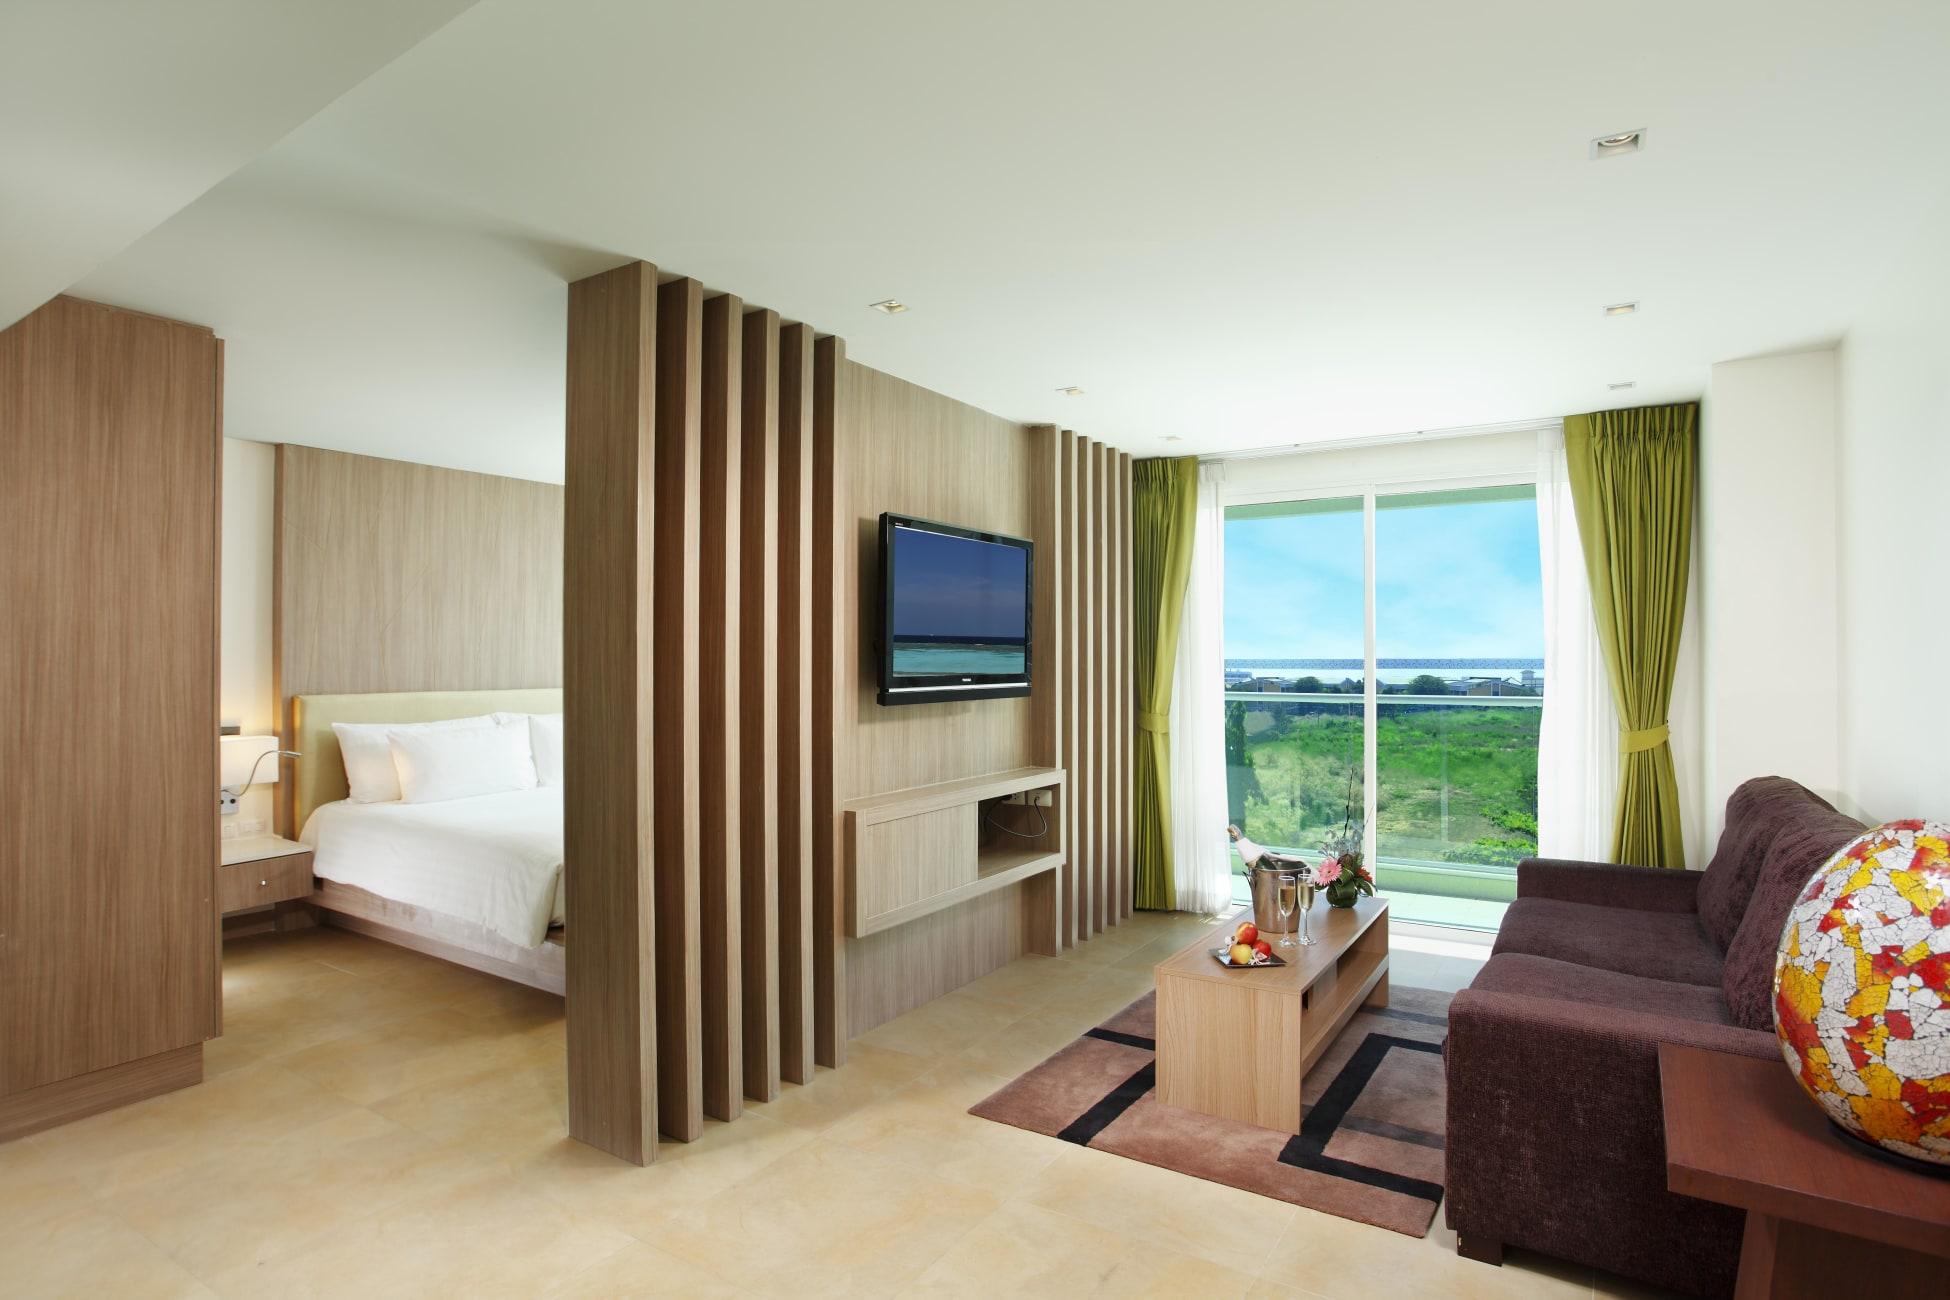 Hotel Di Pattaya Hotel Centara Pattaya Trivago Co Id